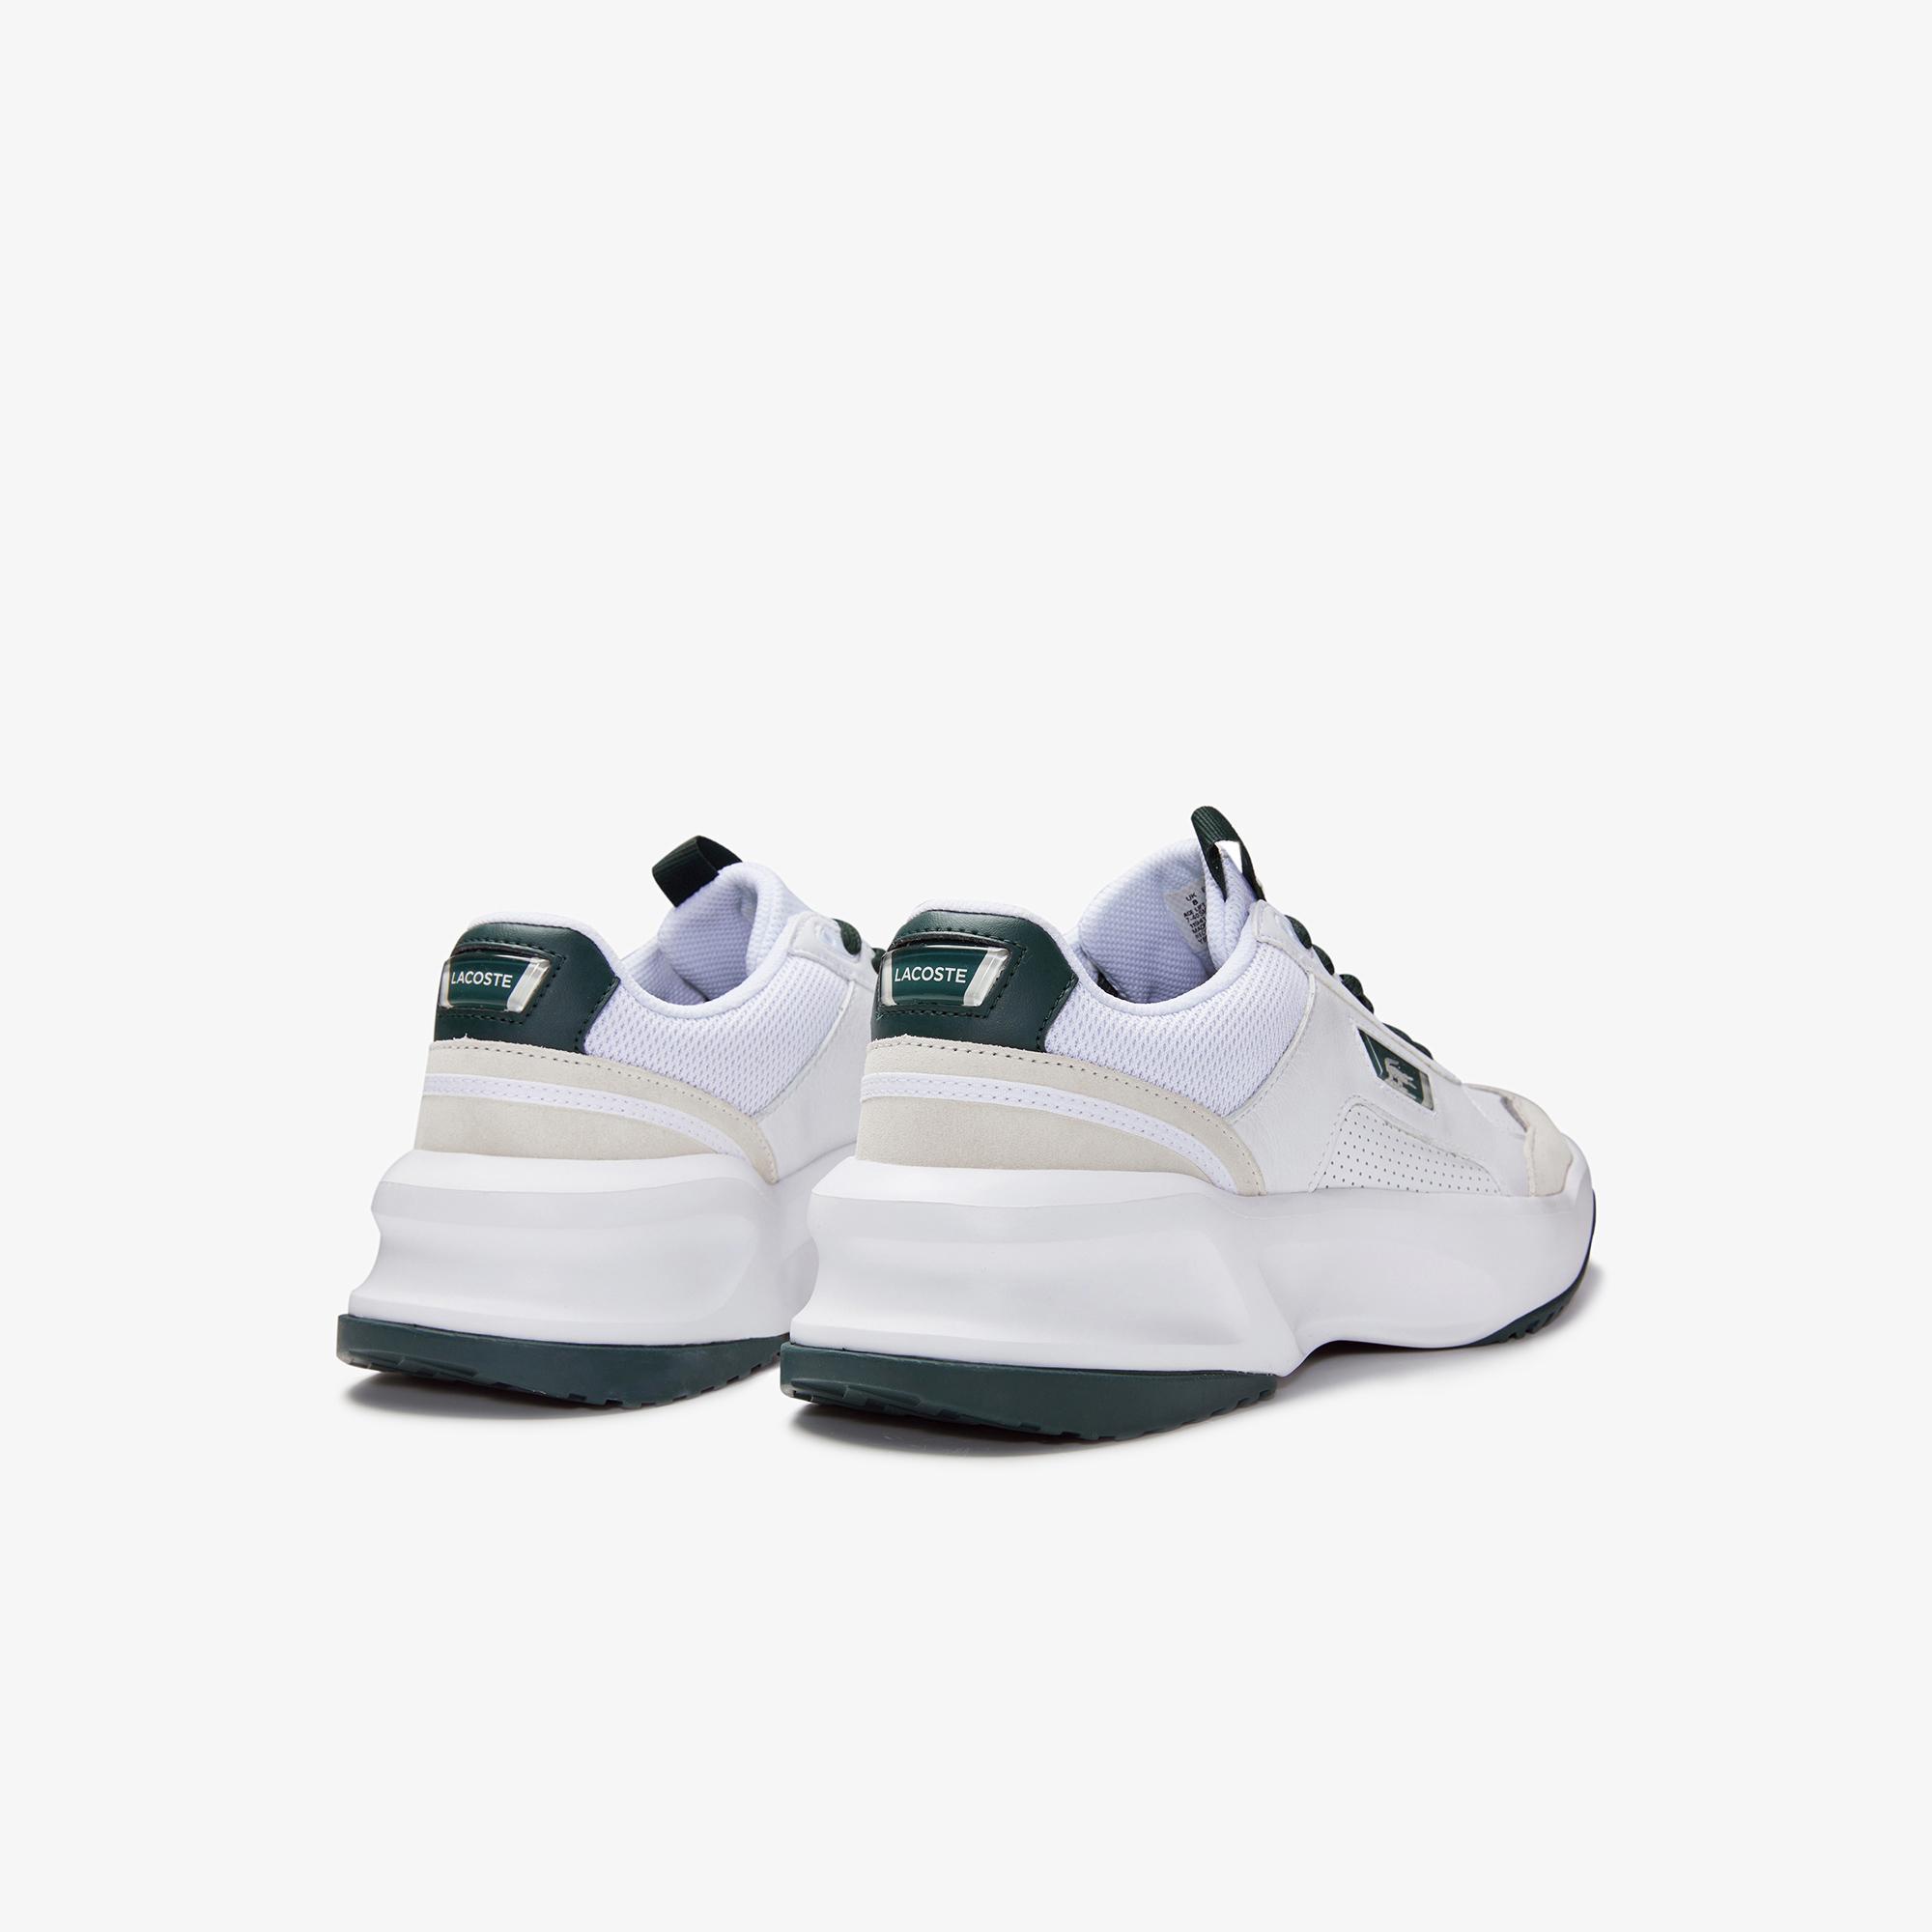 Lacoste Men's Ace Lift Colourblock Leather Reflective Sneakers